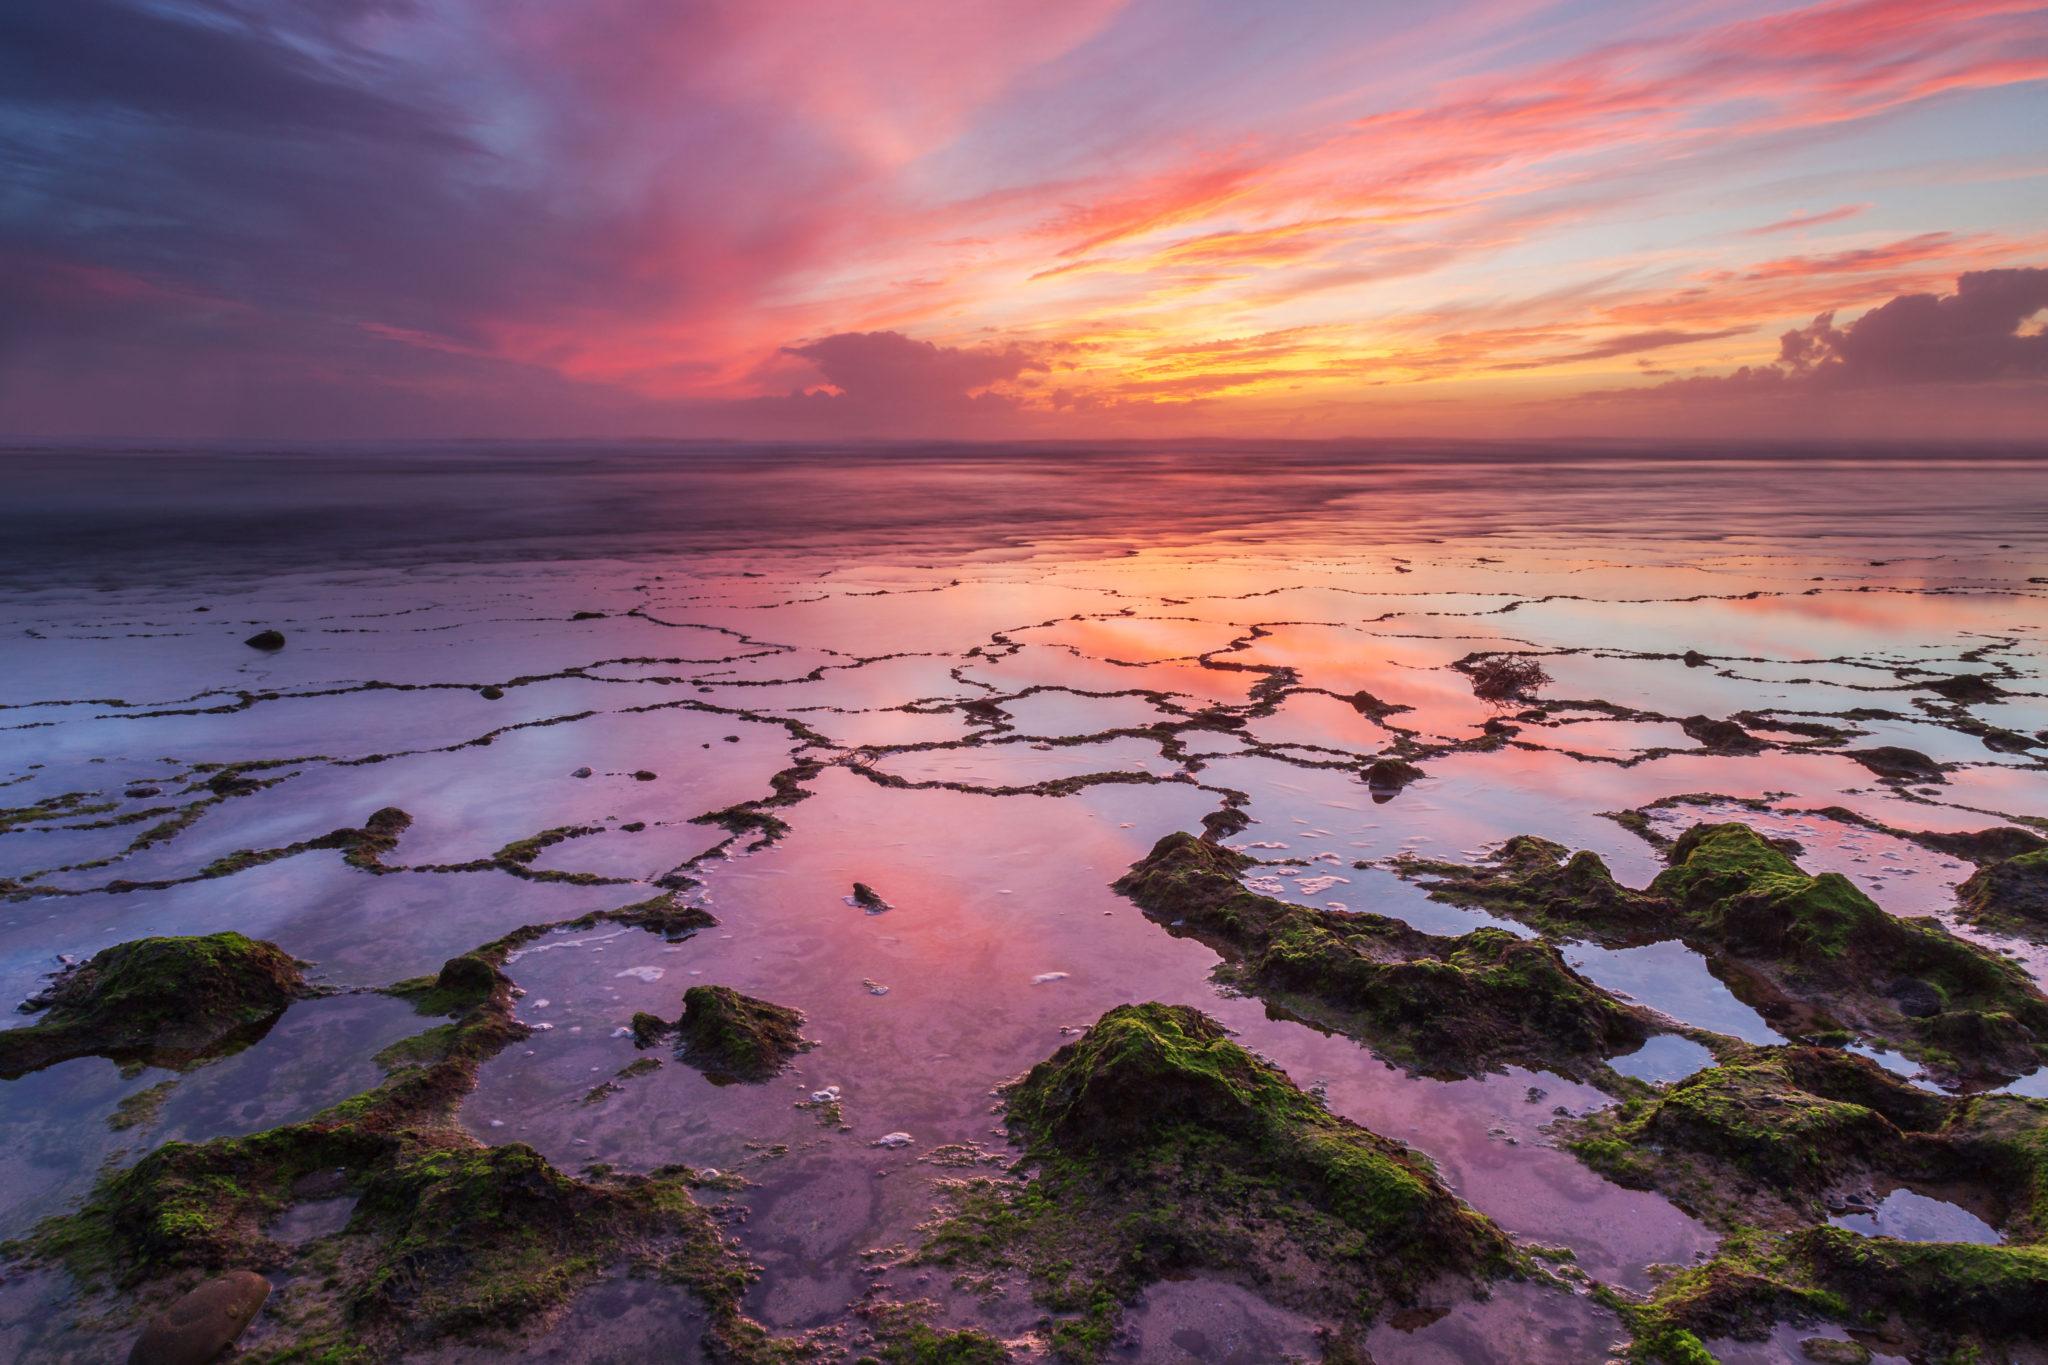 Sunset, Portugal Vilanove-de-Milfontes by Fabio Crudele, ISKS artist 2017